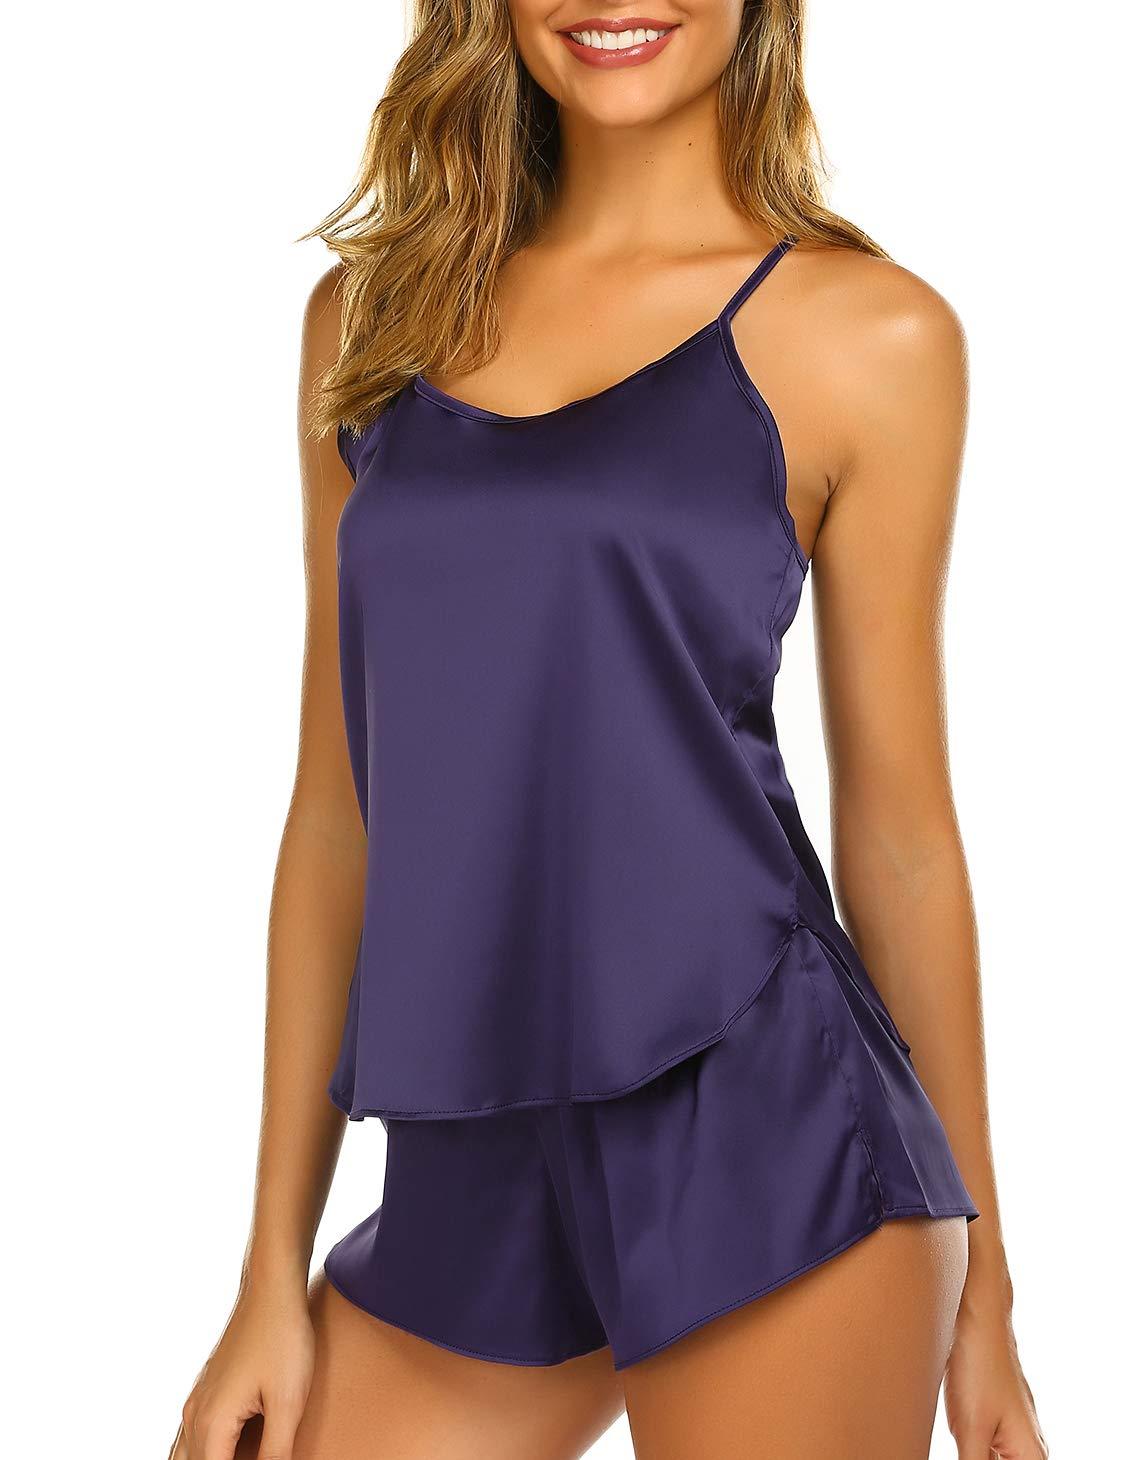 Ekouaer Sleepwear Lingerie Pajamas Nightwear